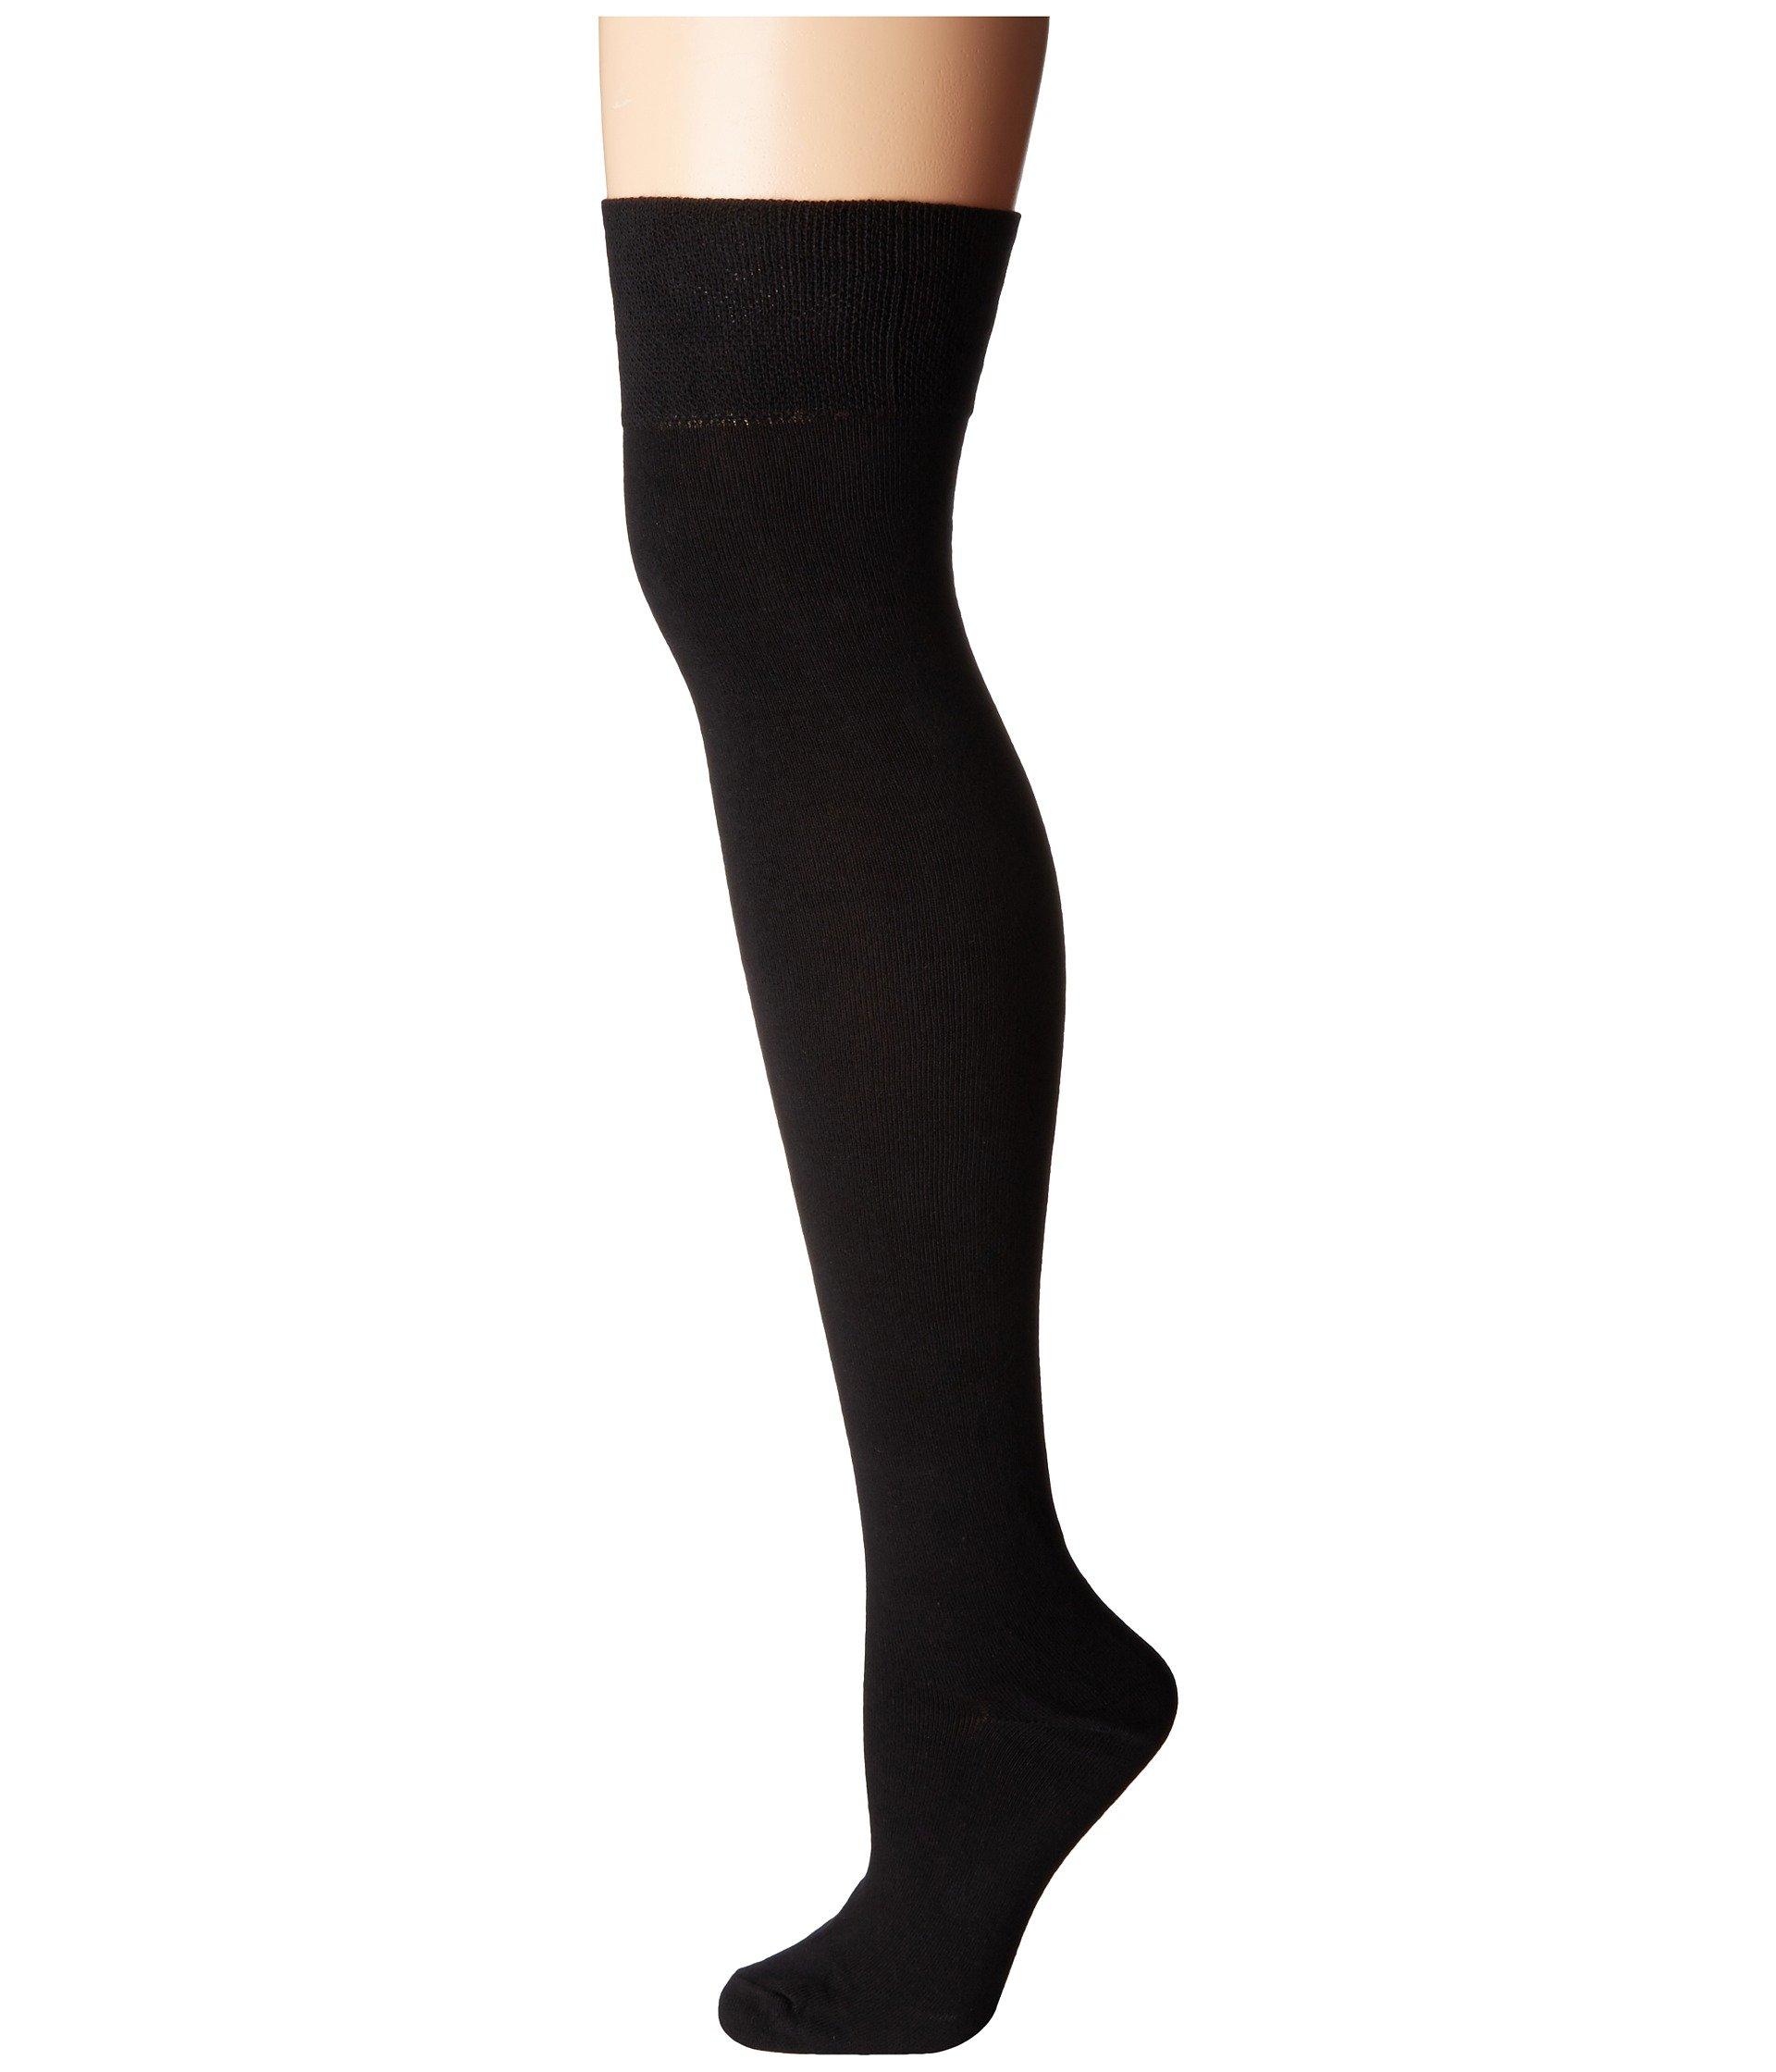 Black Knee Over Solid Socksmith The qWcwRITCC4